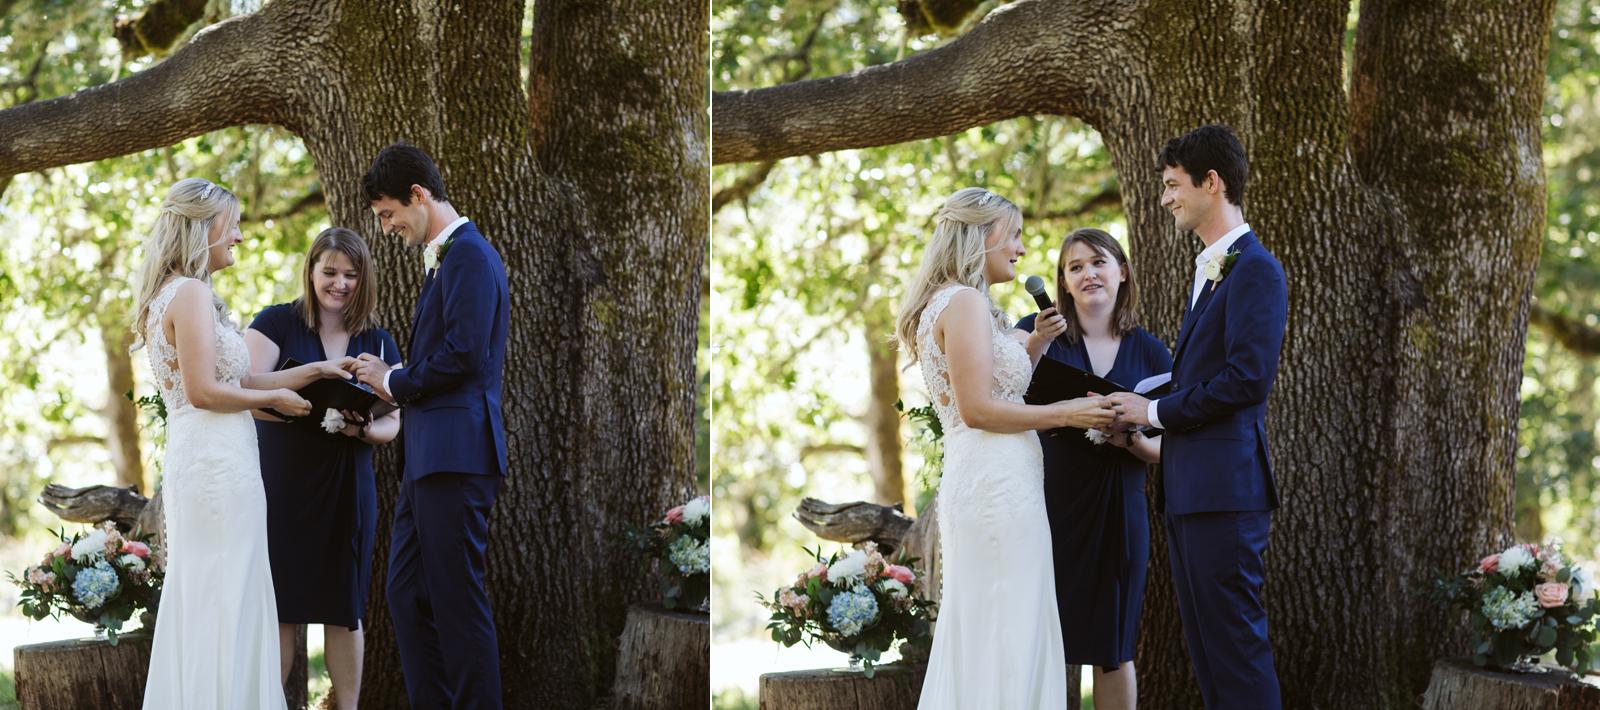 056-daronjackson-rachel-michael-wedding-mtpisgah.jpg